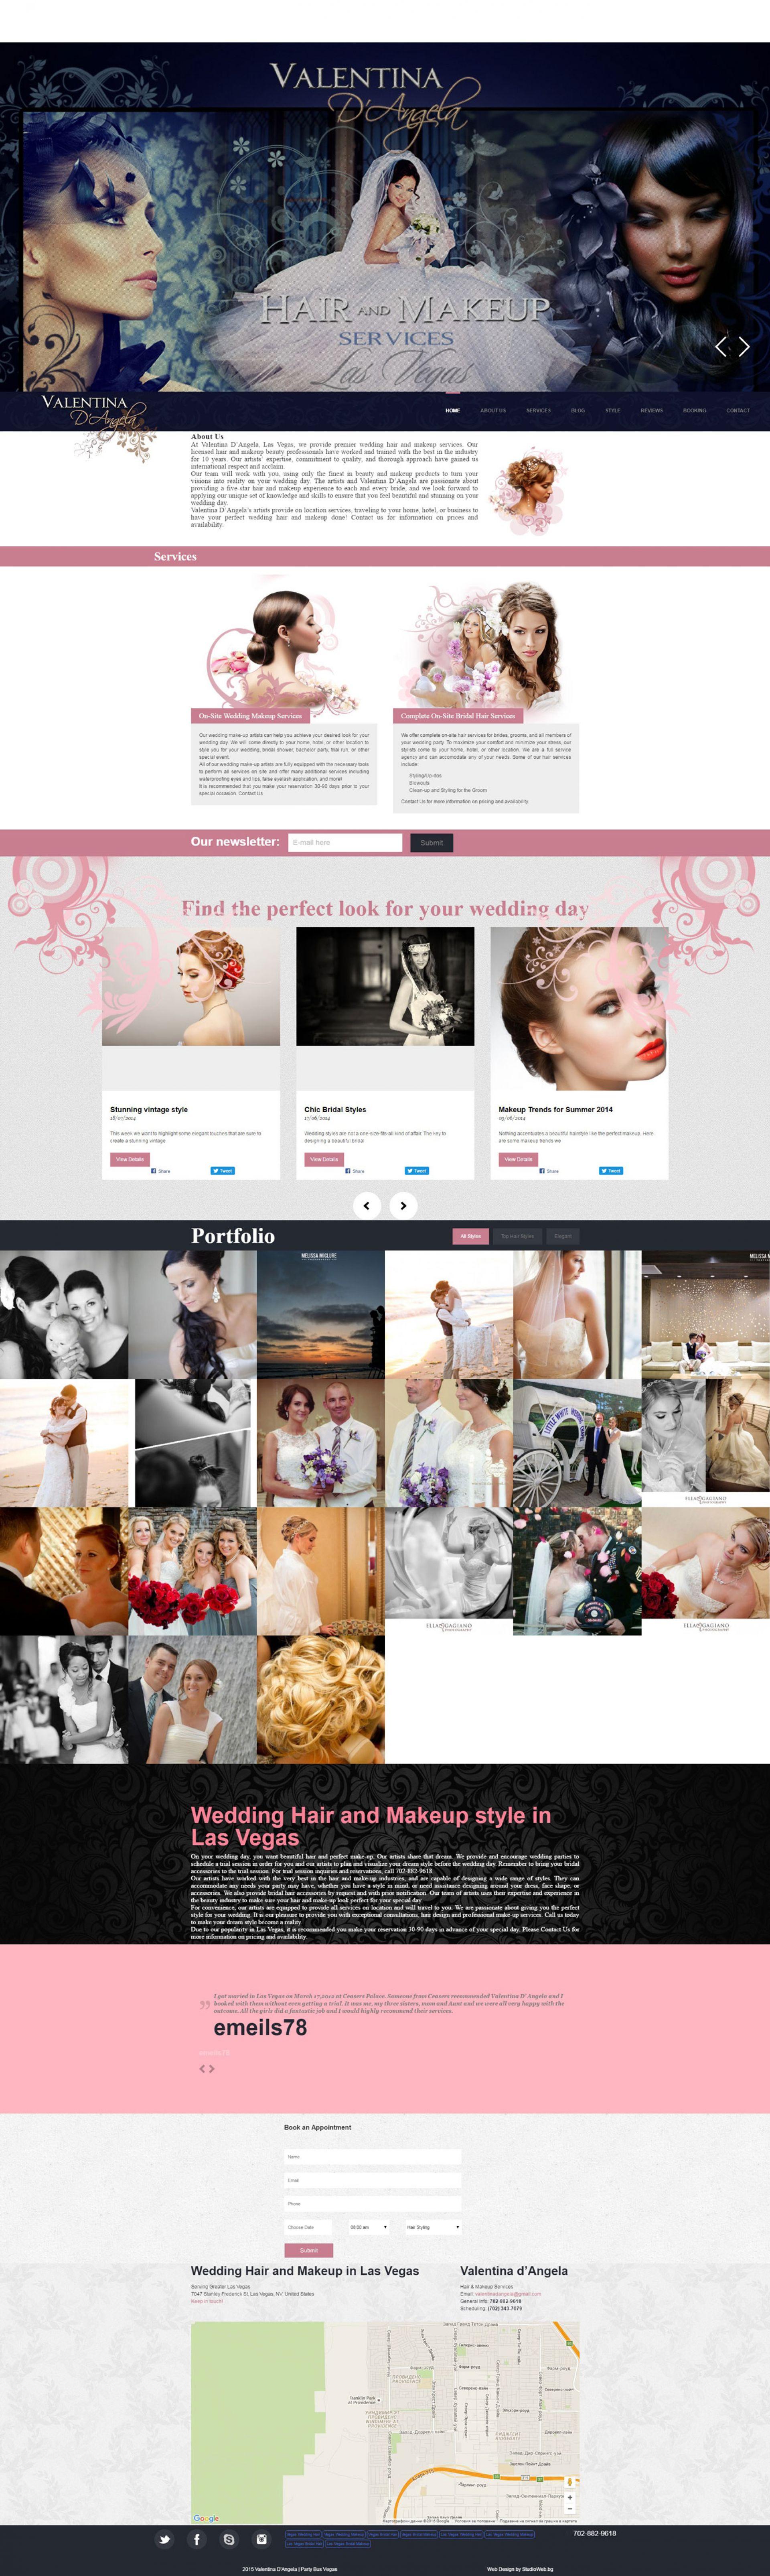 Valentina D'Angela - сватбени прически и грим